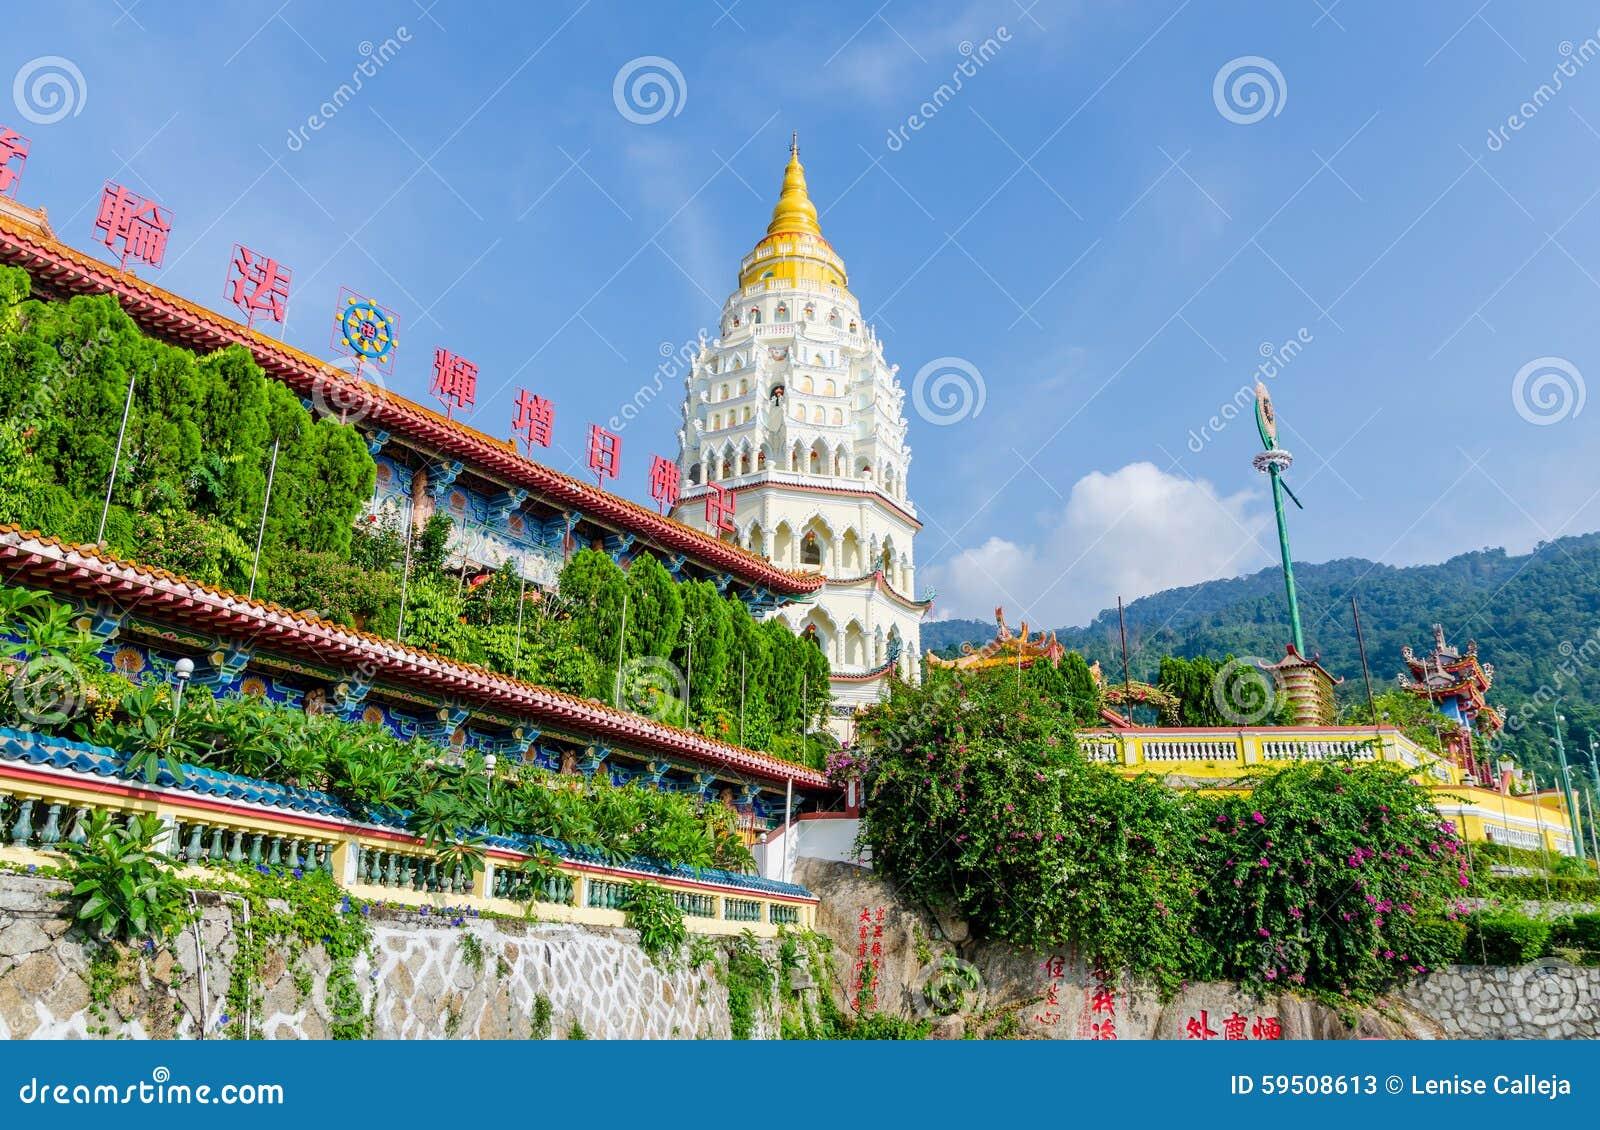 Kek Lok Si Temple i Penang, Malaysia